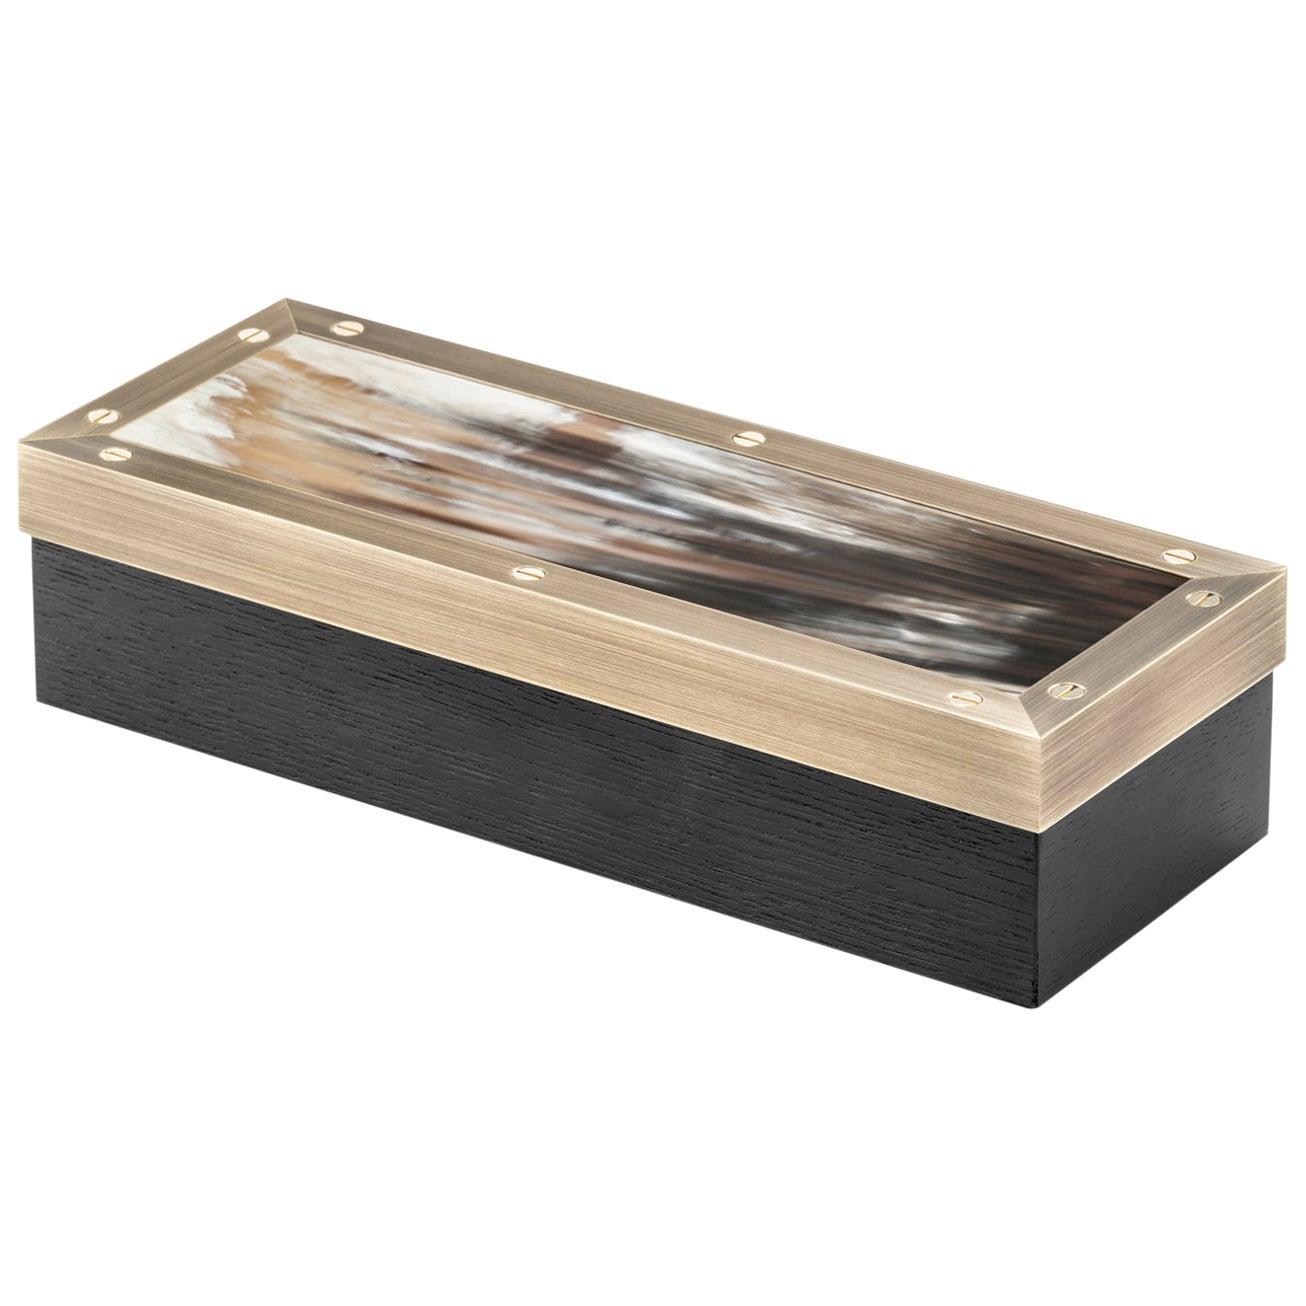 Zefiro Box in Black Oak, Matte Corno Italiano and Burnished Brass, Mod. 5268